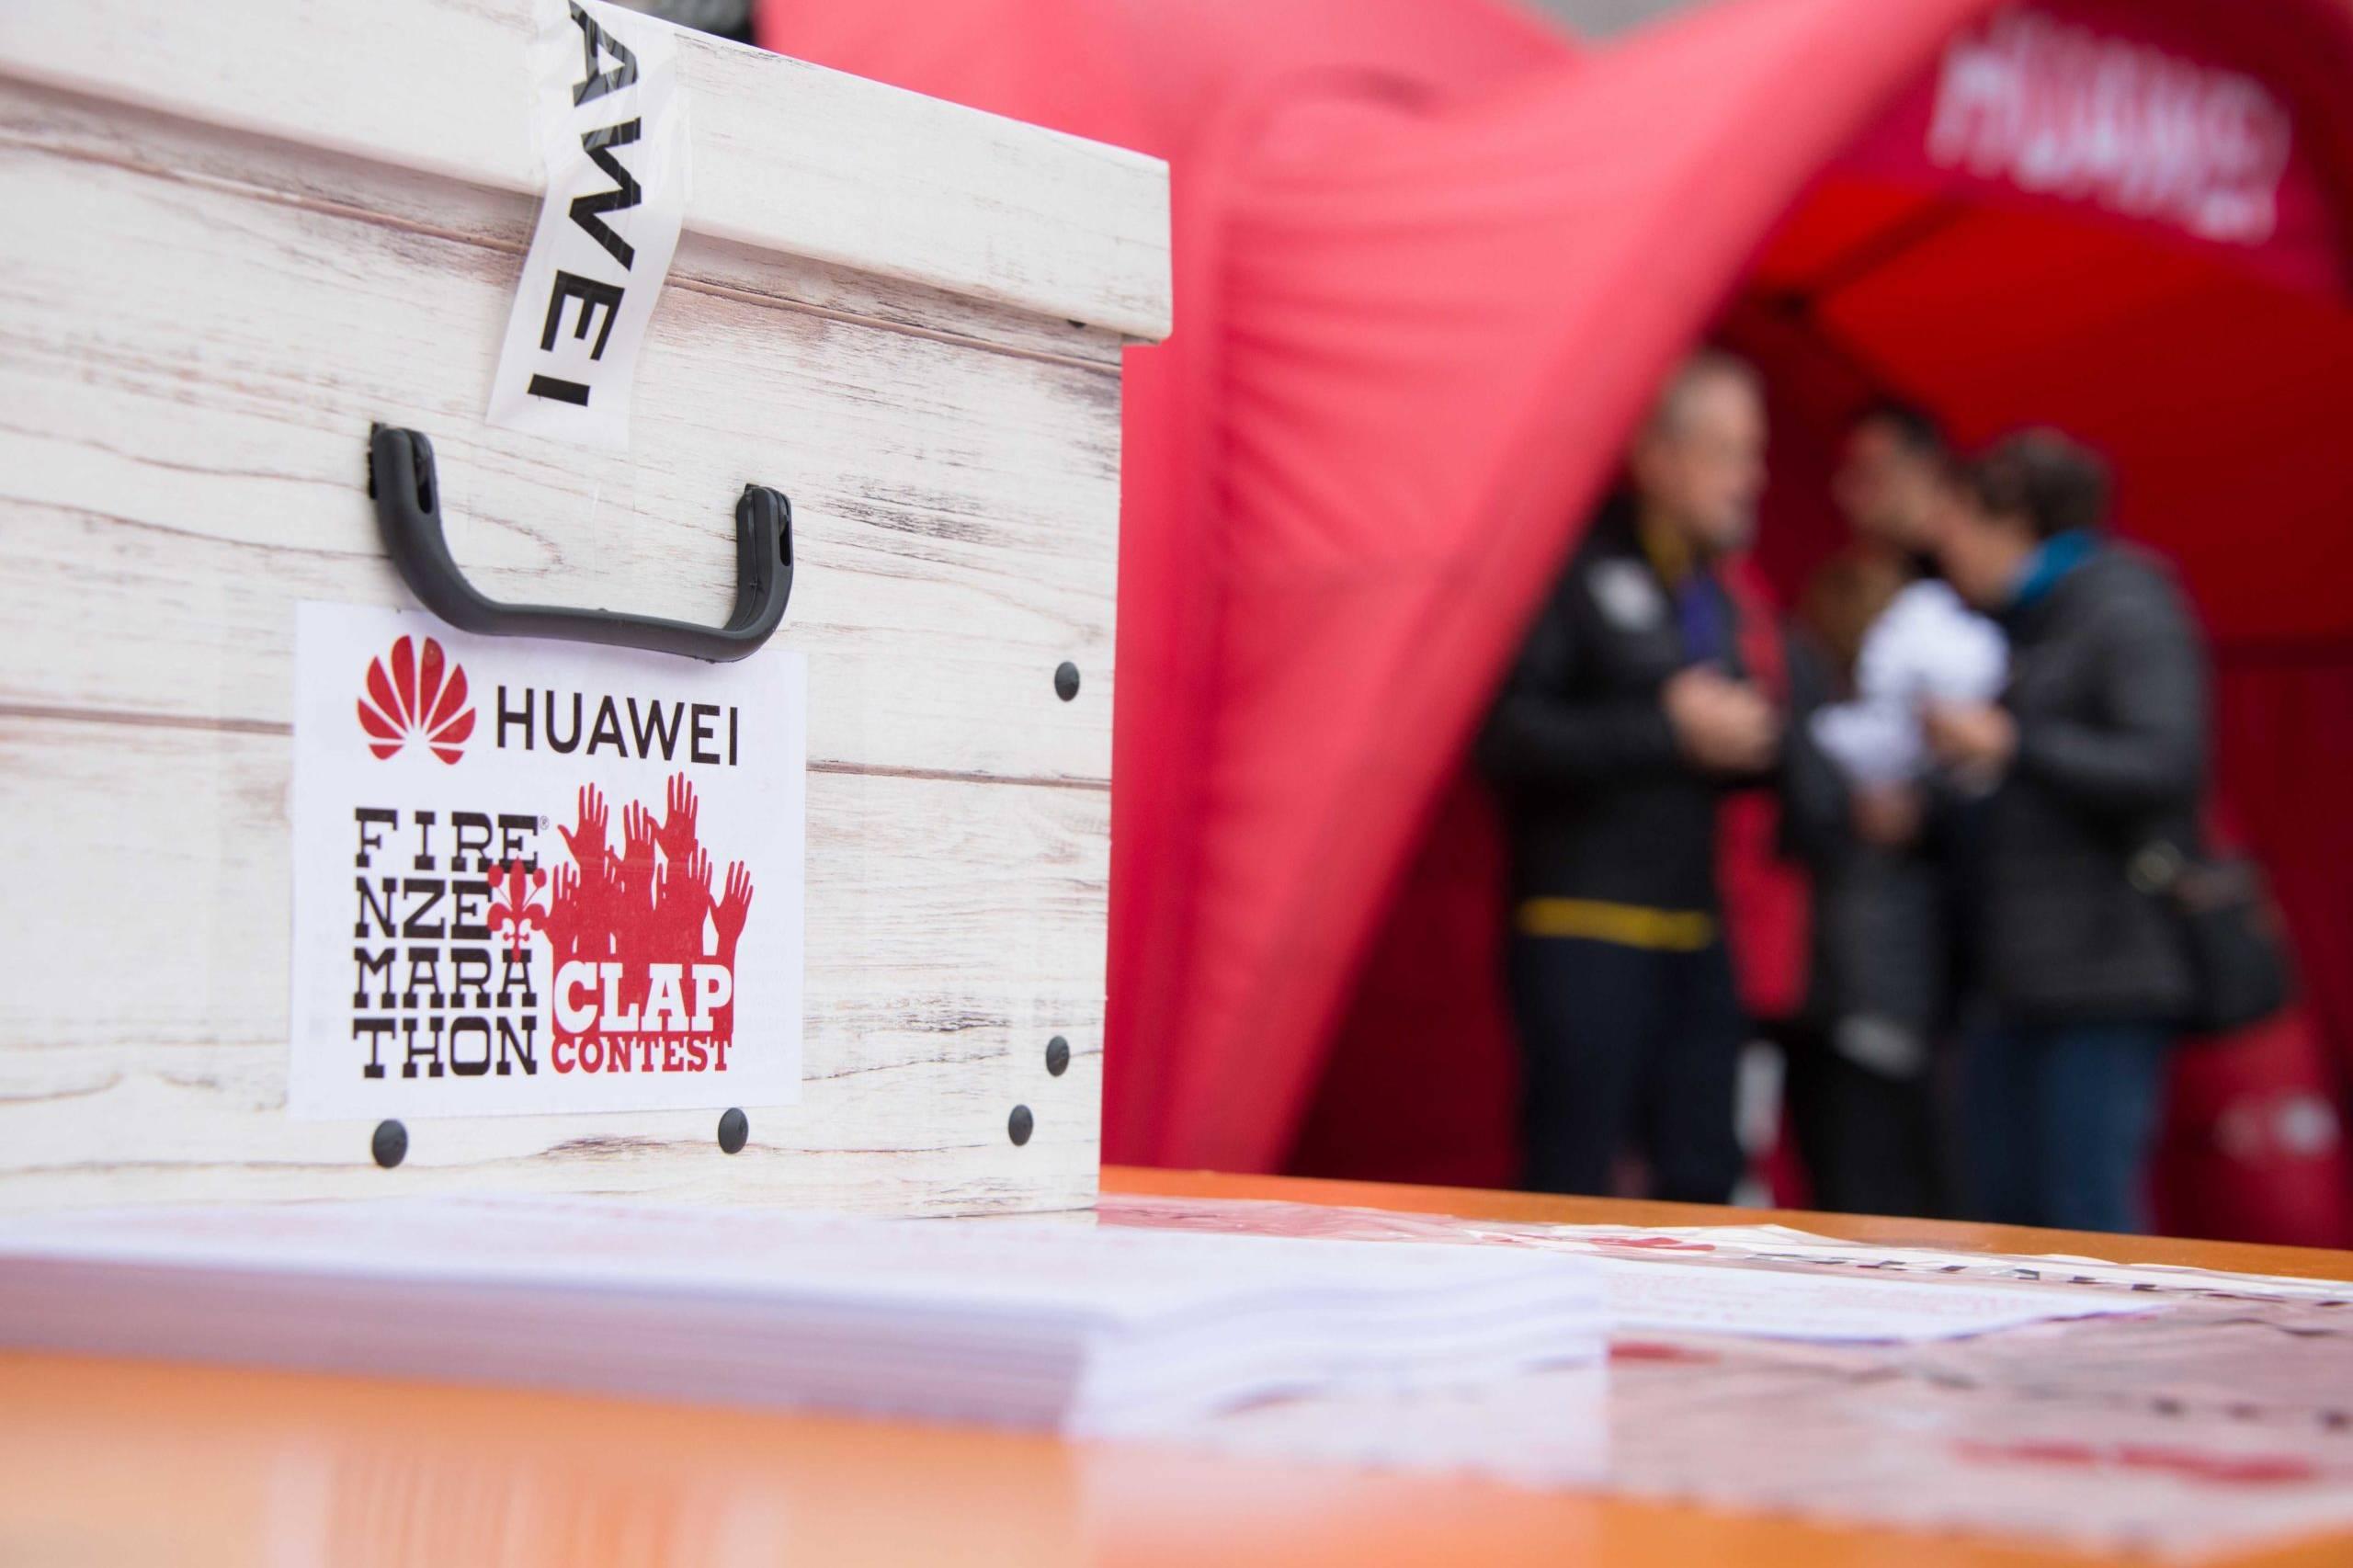 Firenze Marathons Huawei